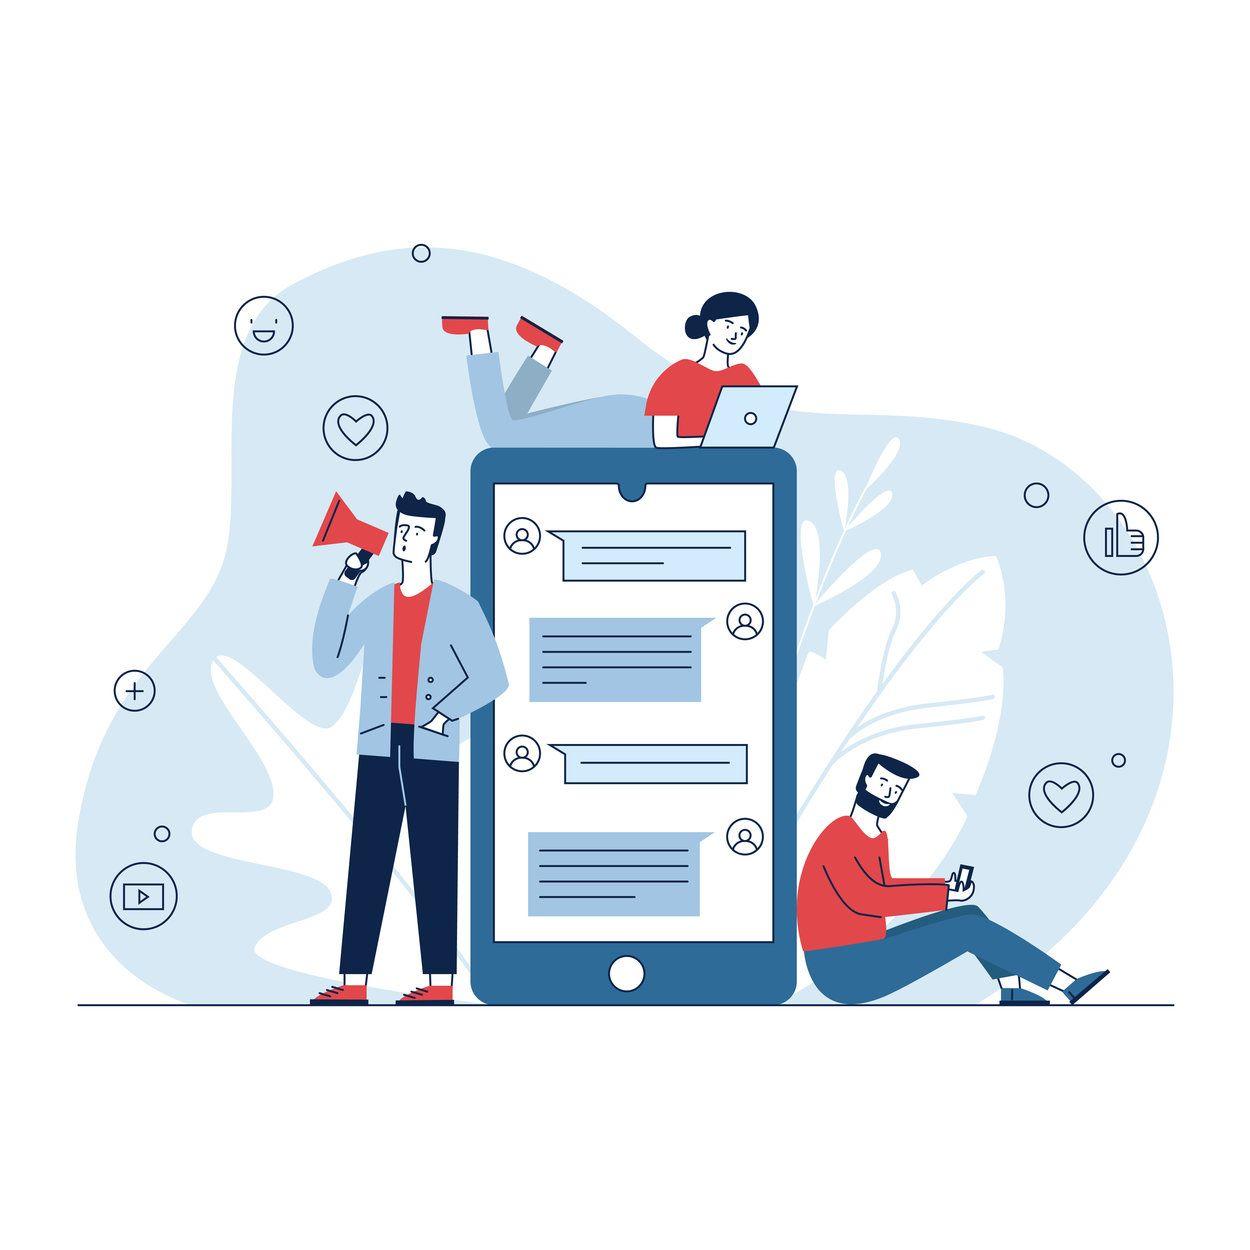 Acércate a tus clientes a través del comercio conversacional